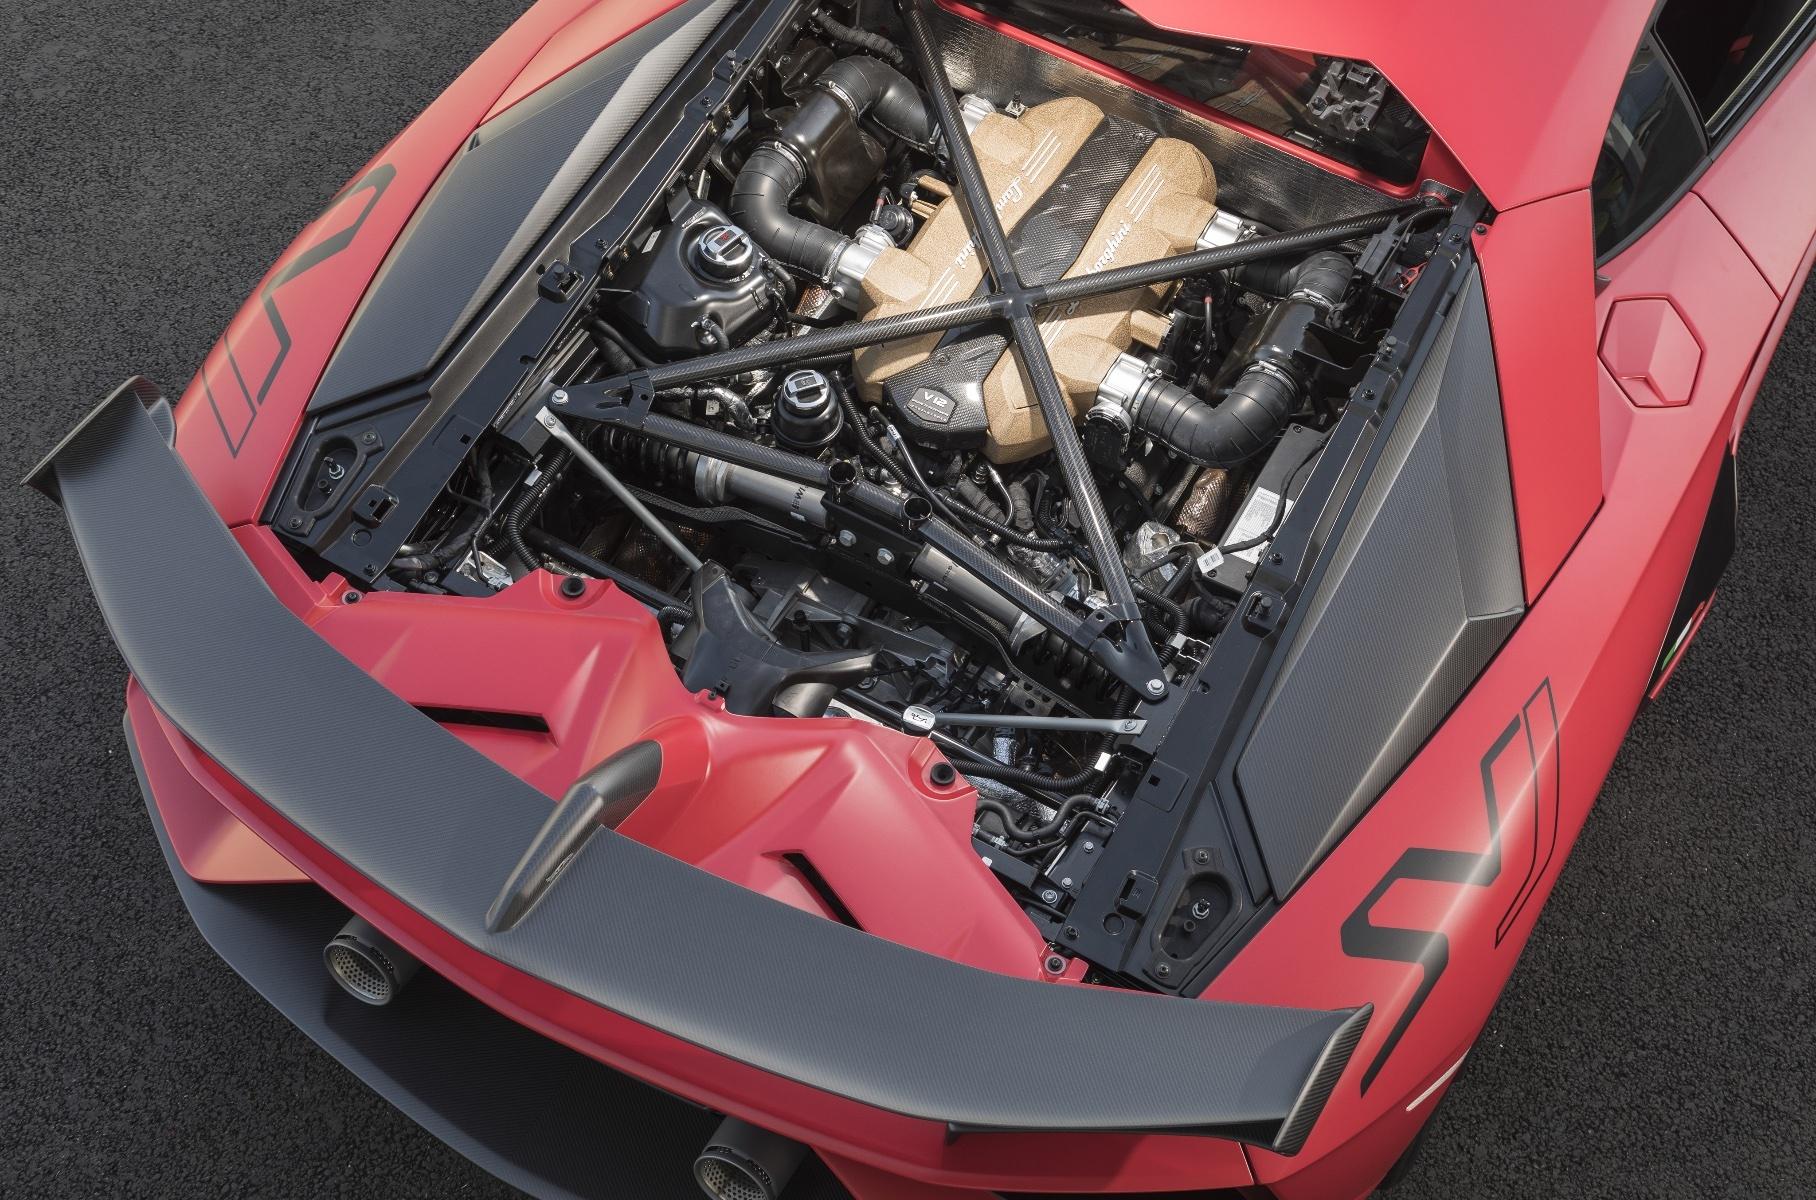 Lamborghini выпустит в 2021 году две модели с двигателем V12